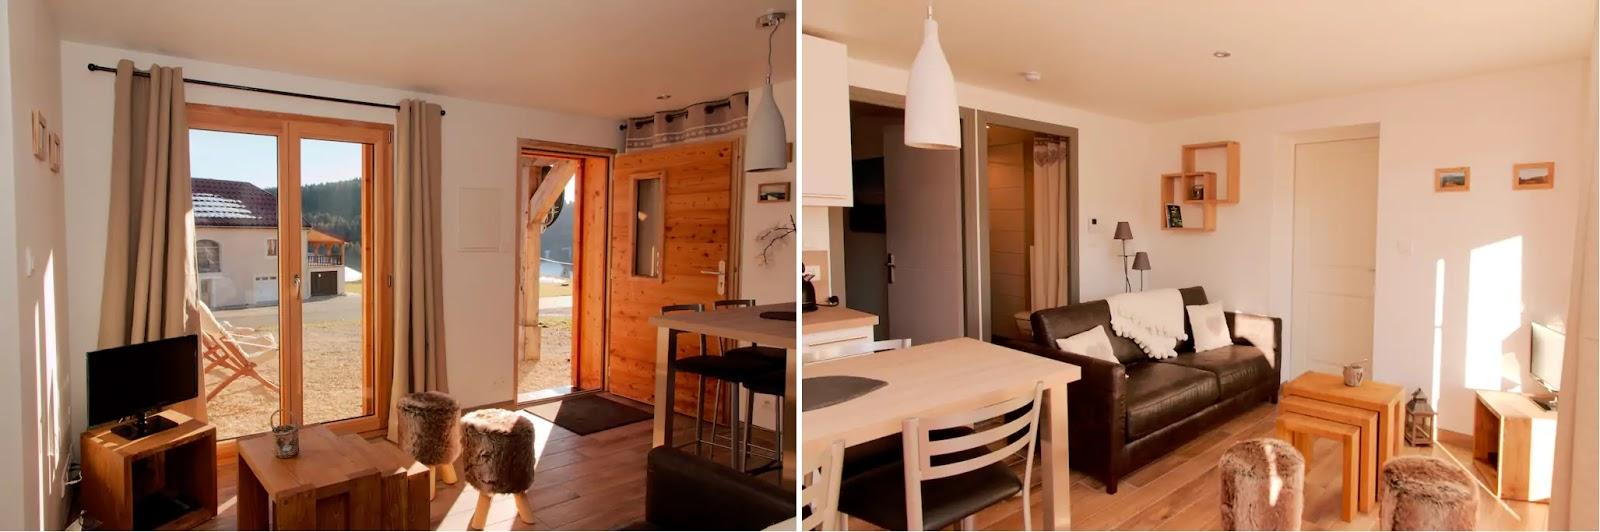 Jura, hébergement, Saint-Claude, La Pesse, Panoramic, restaurant, hôtel